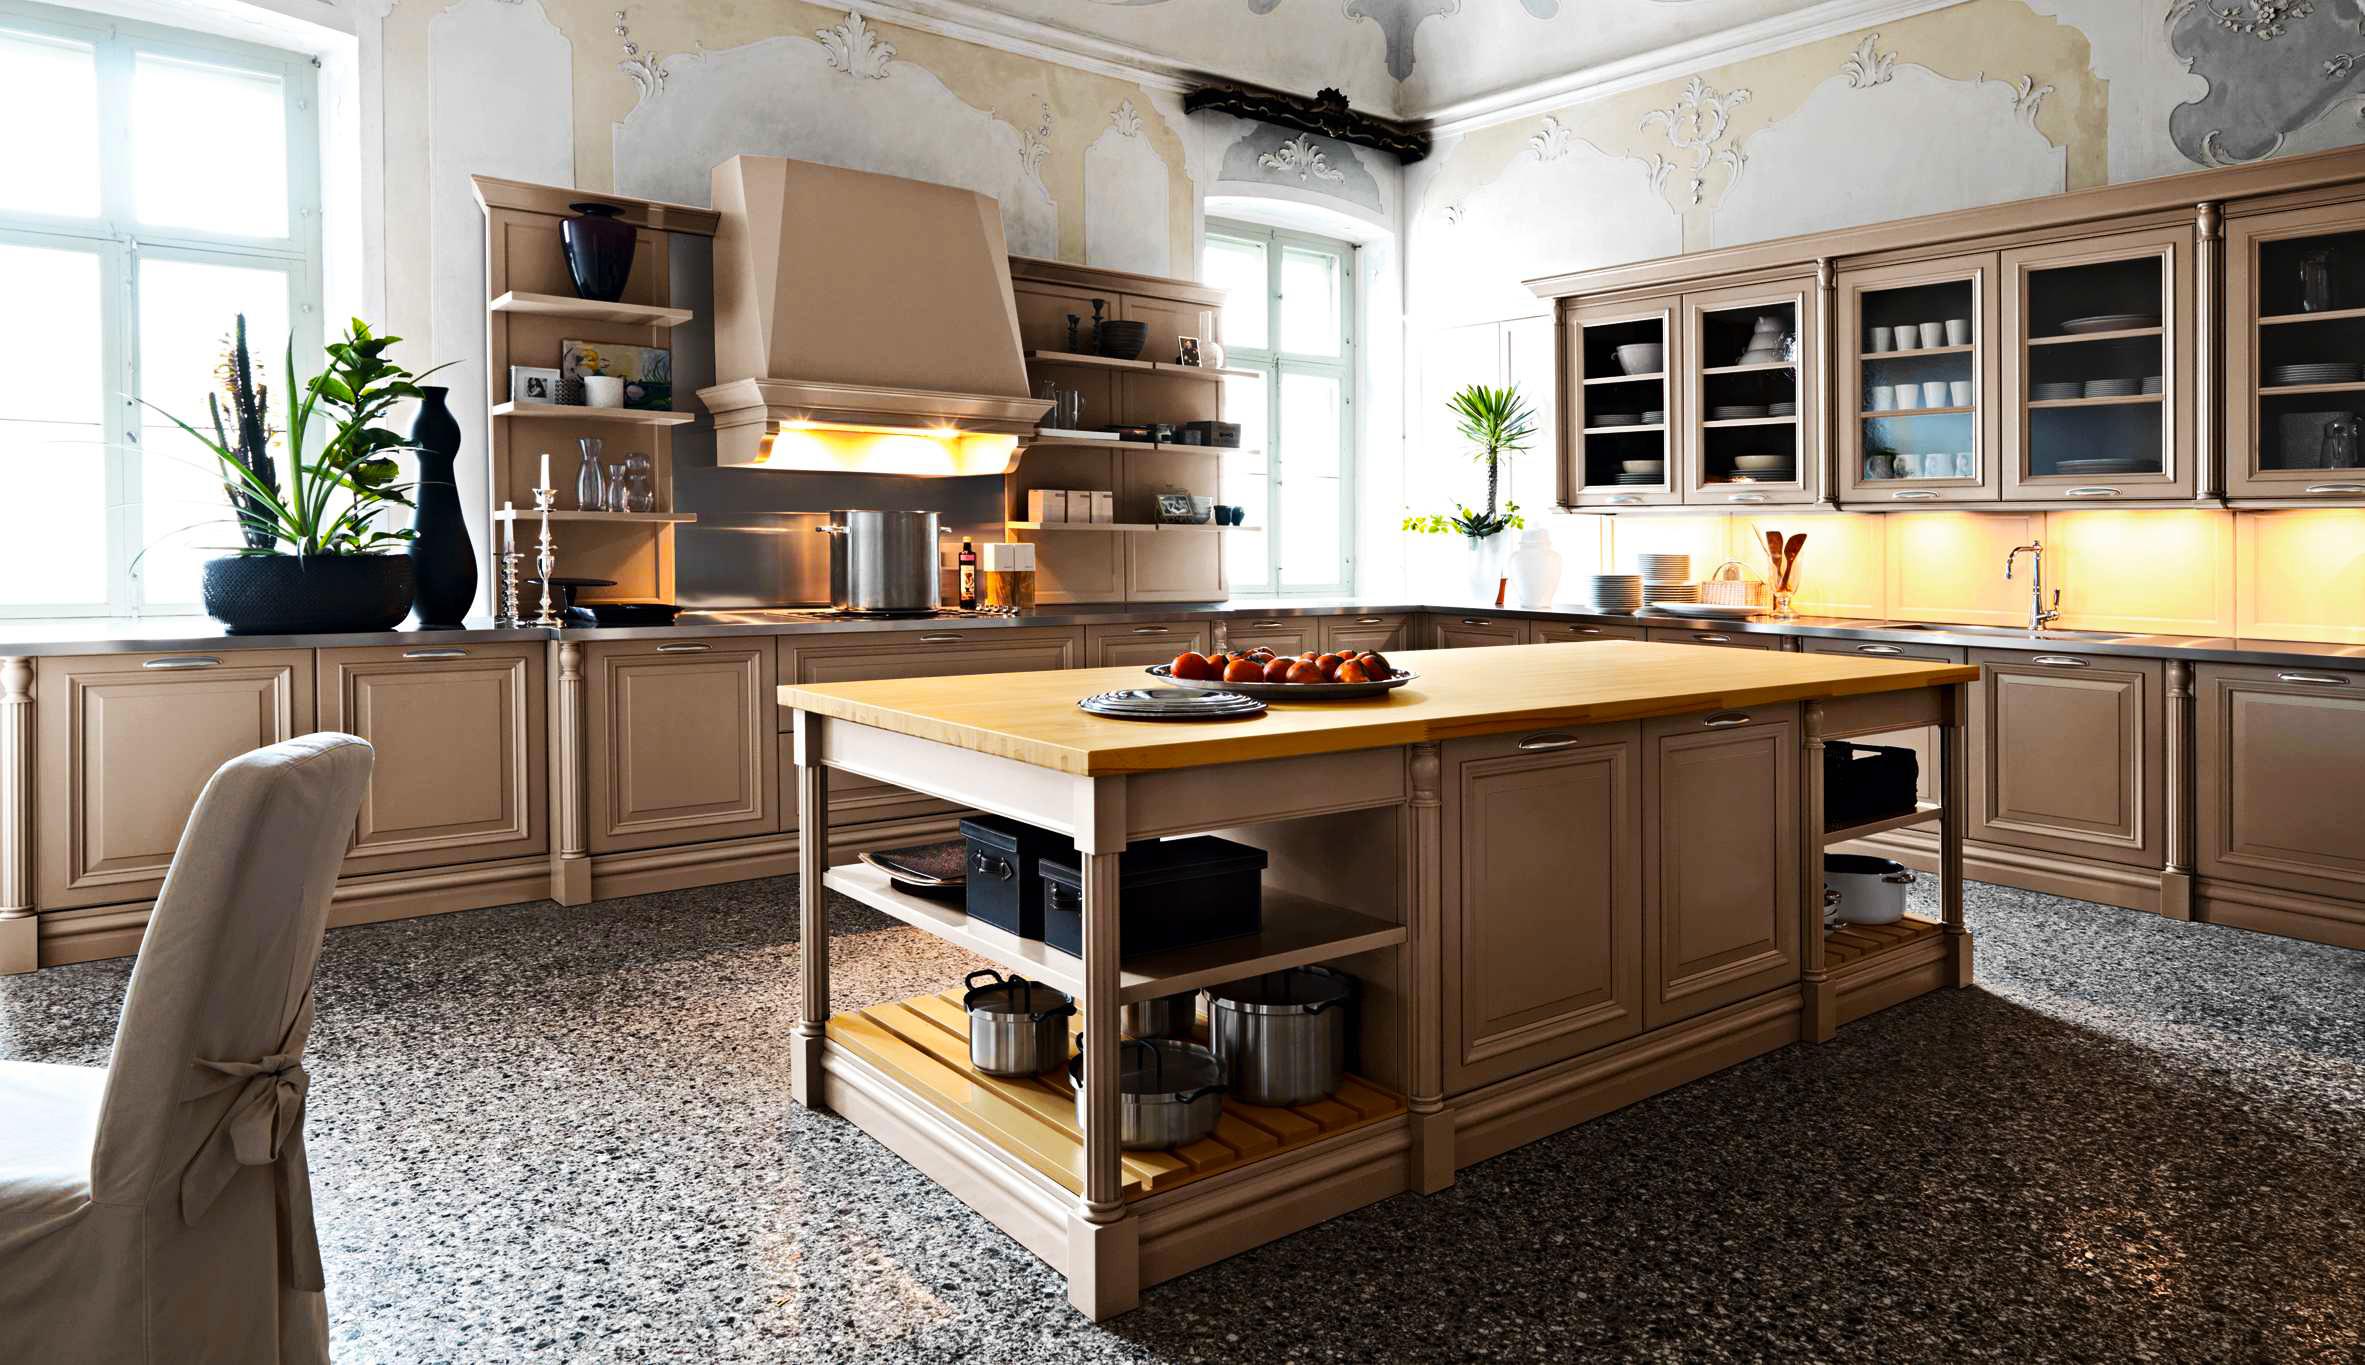 italian-kitchen-design-ideas-for-kitchen-remodeling-traditional-italian-kitchen-italian-kitchen-designs-with-modern-italian-kitchen-island-designs-photos